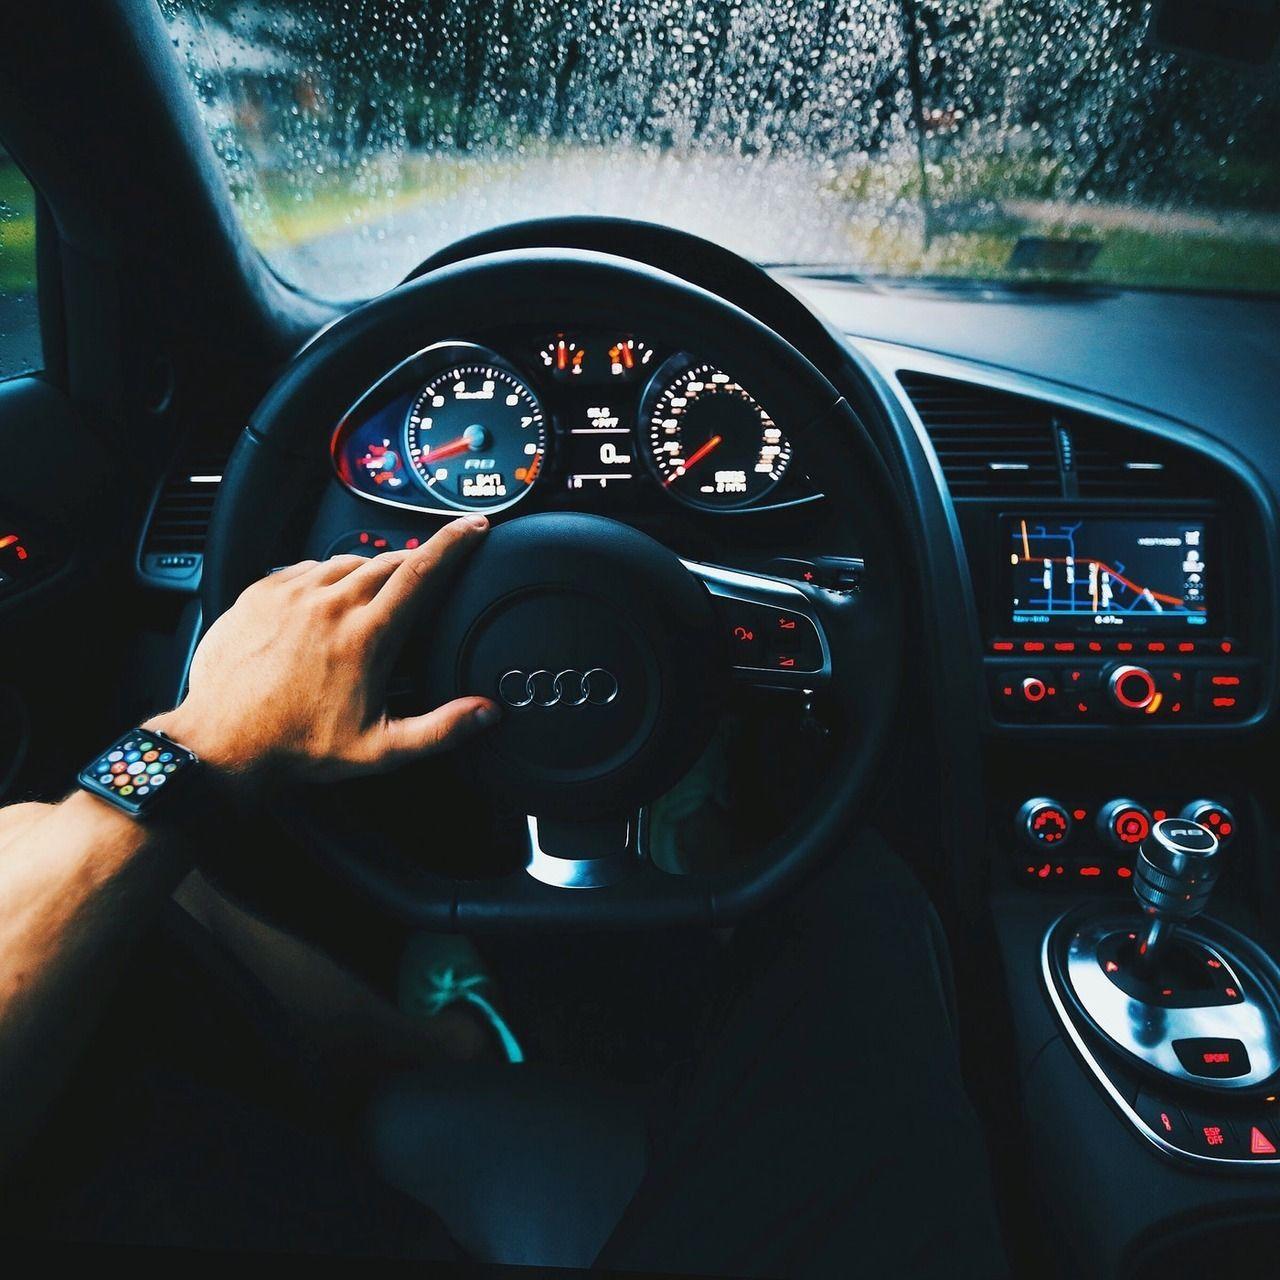 Pin by D R I F T on gio Audi cars, Lyft driver, Car